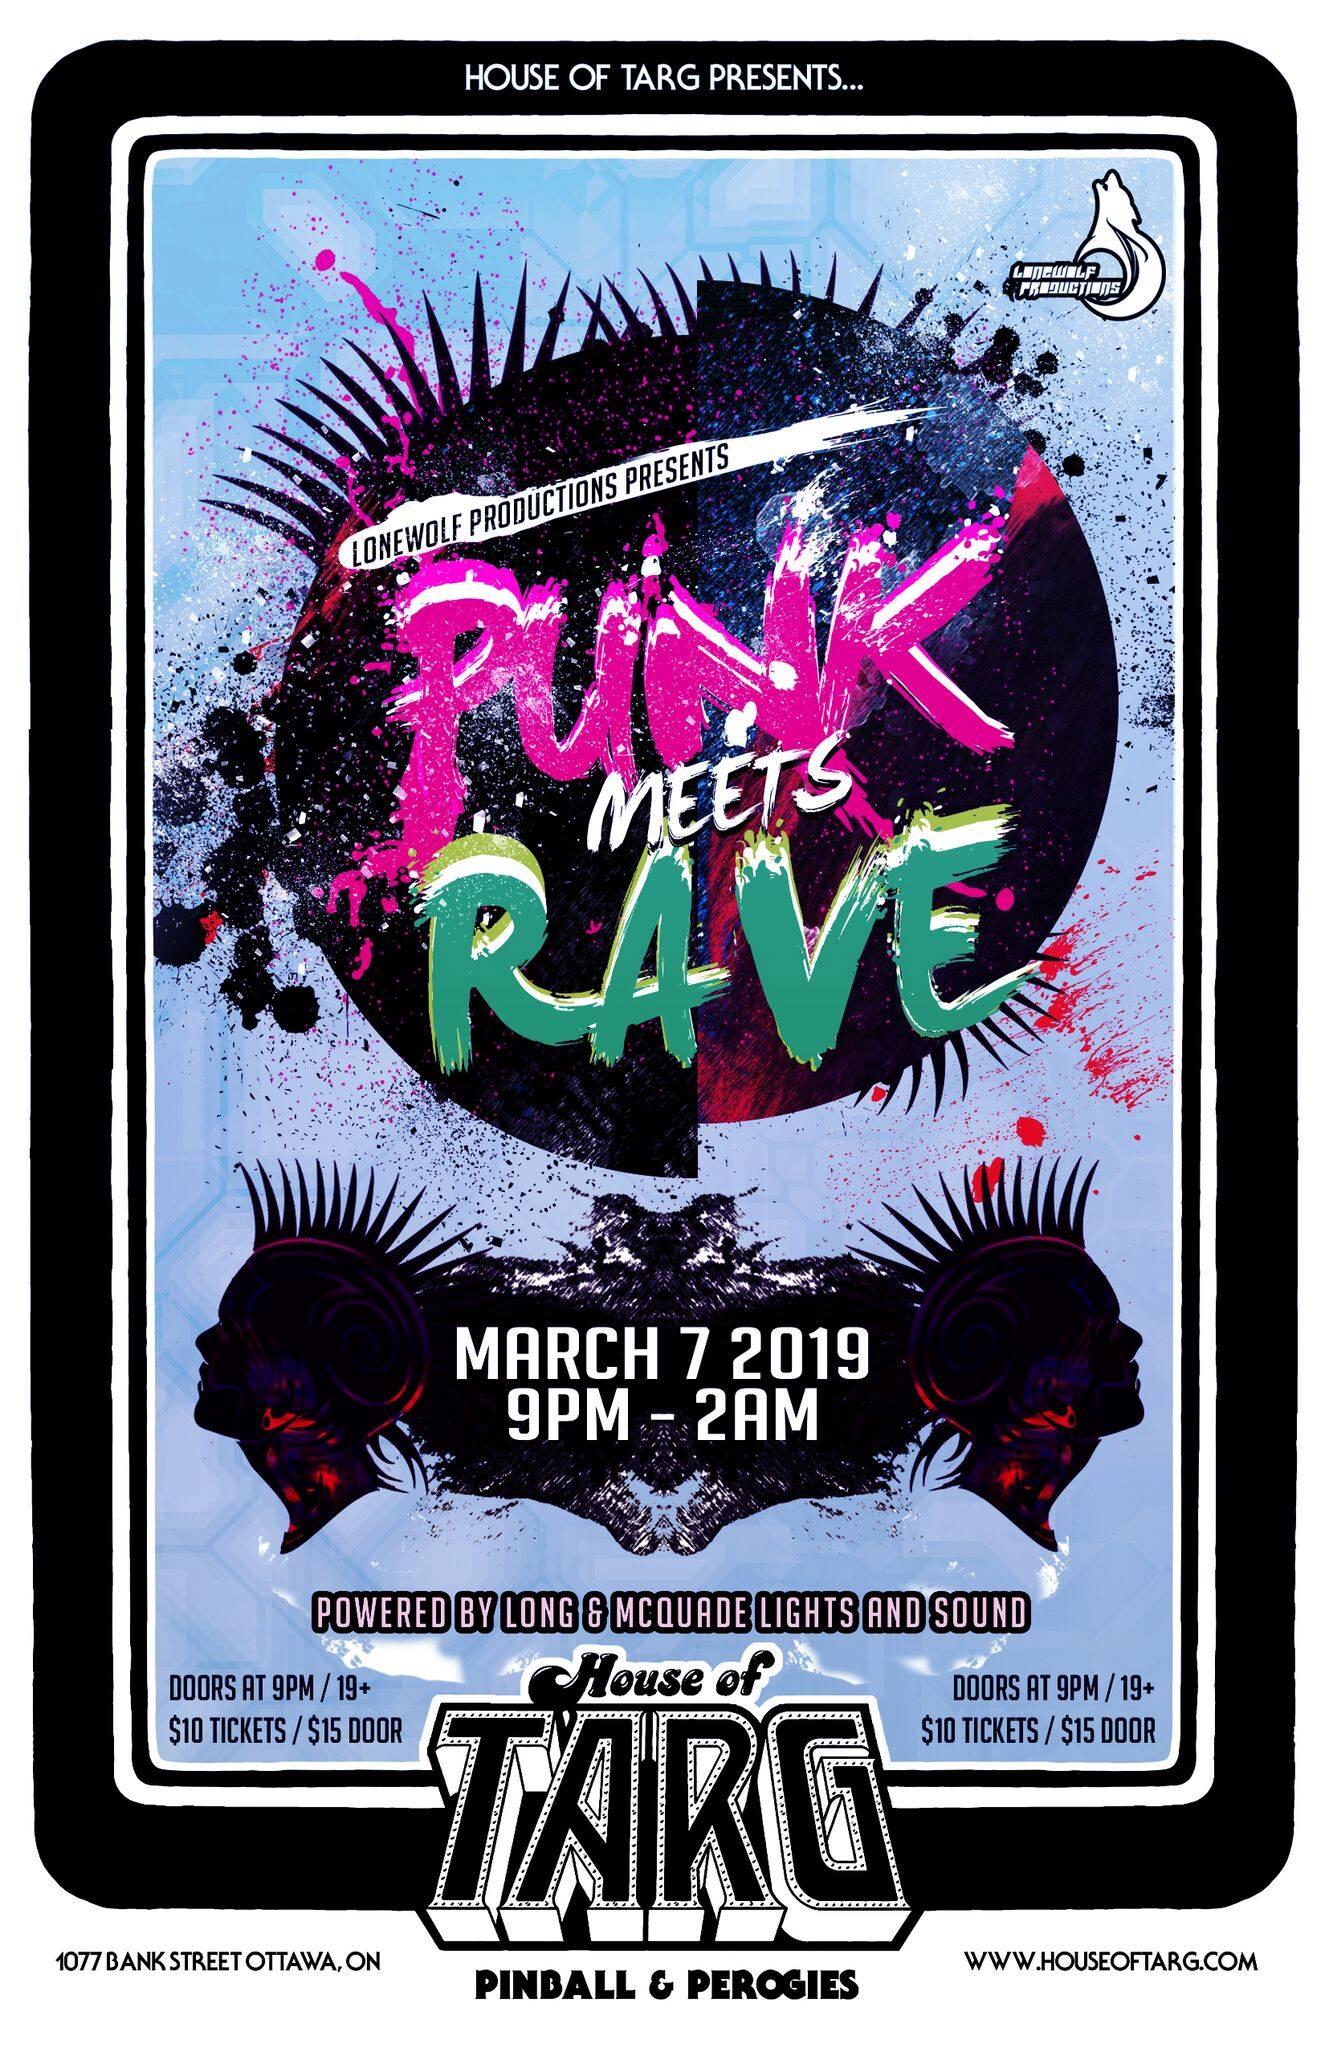 Punk meets Rave March 7 2019.jpg